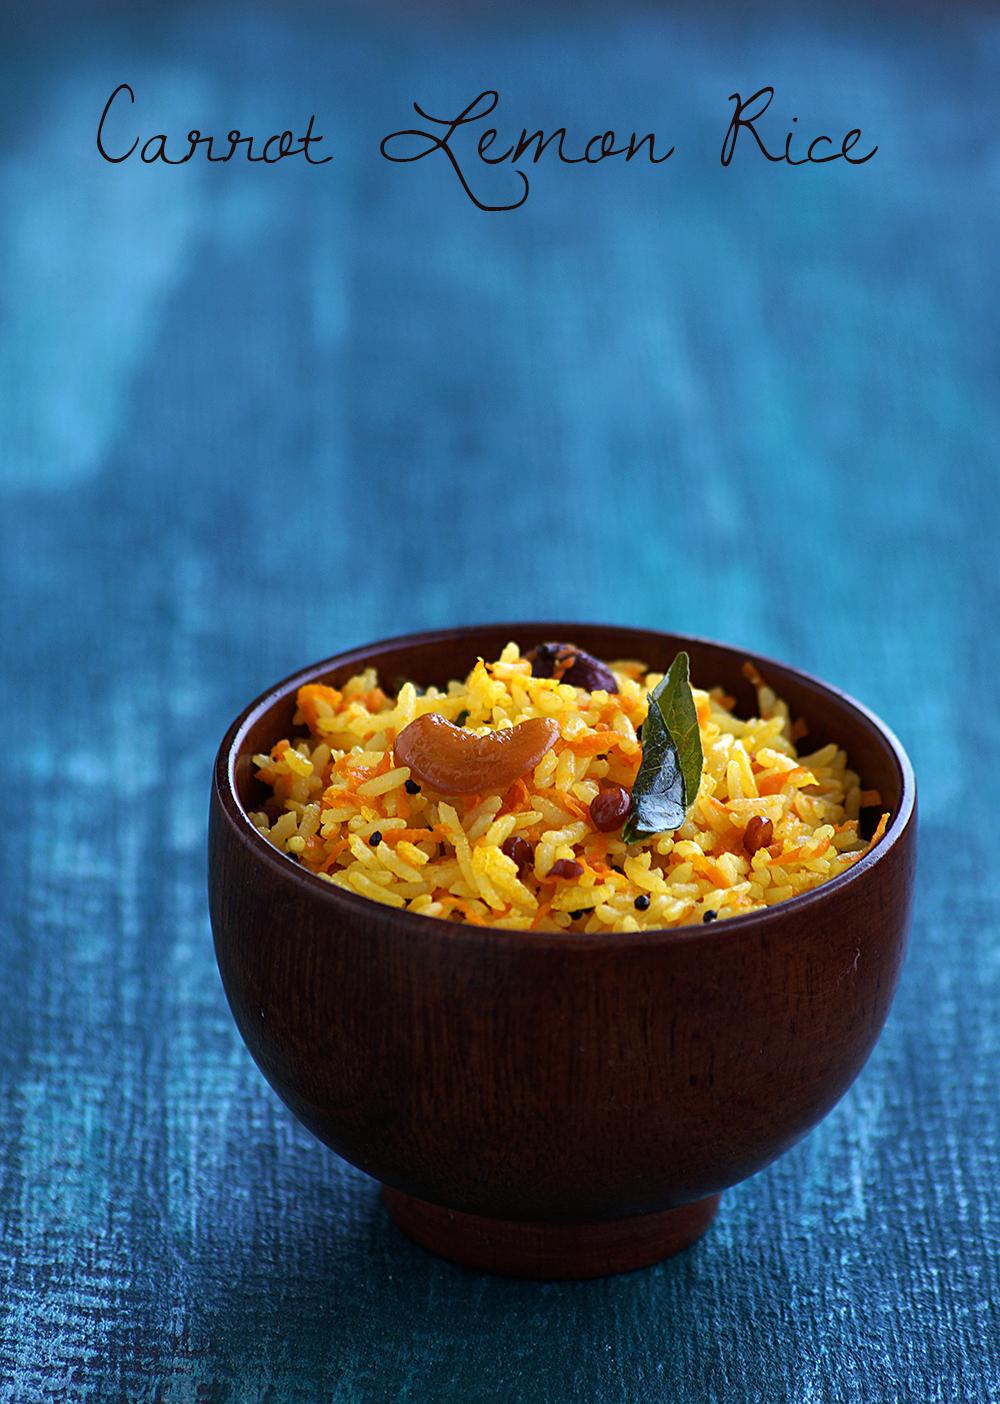 how to make south indian rice recipes, easy carrot nimmakaya pulihora recipe